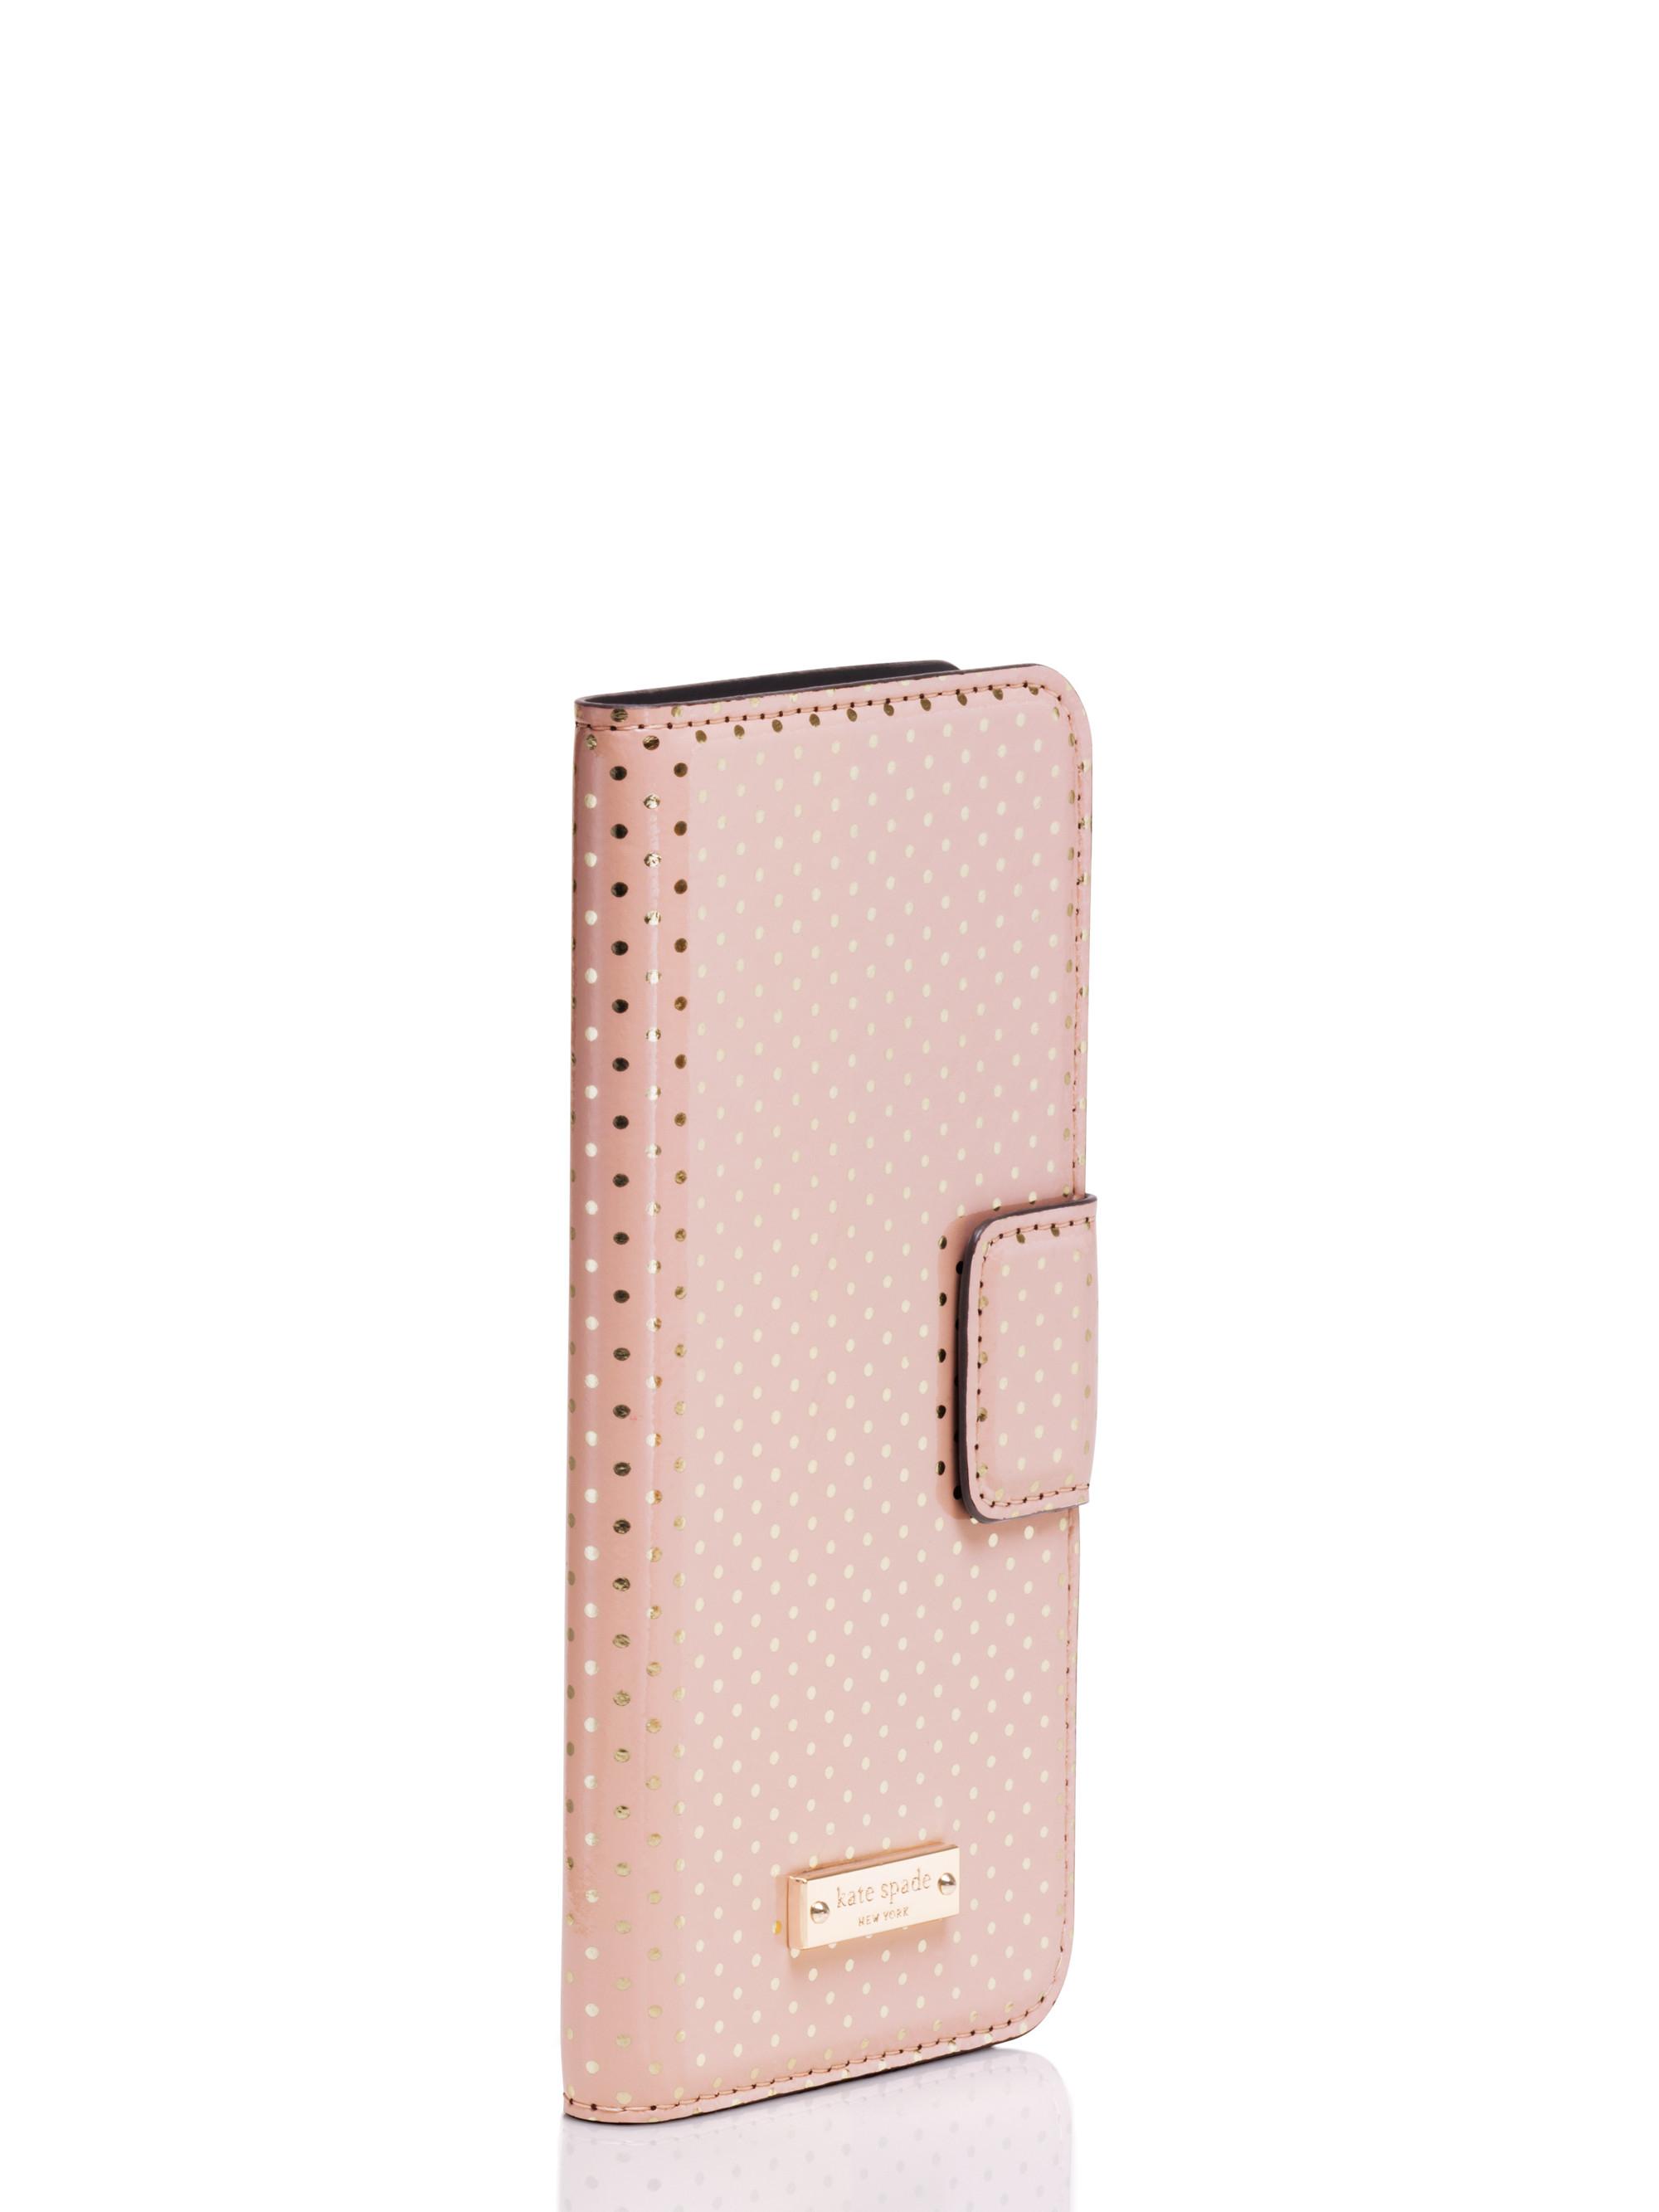 timeless design 342e2 73917 kate spade new york Pink Tiny Gold Dot Iphone 6 Folio